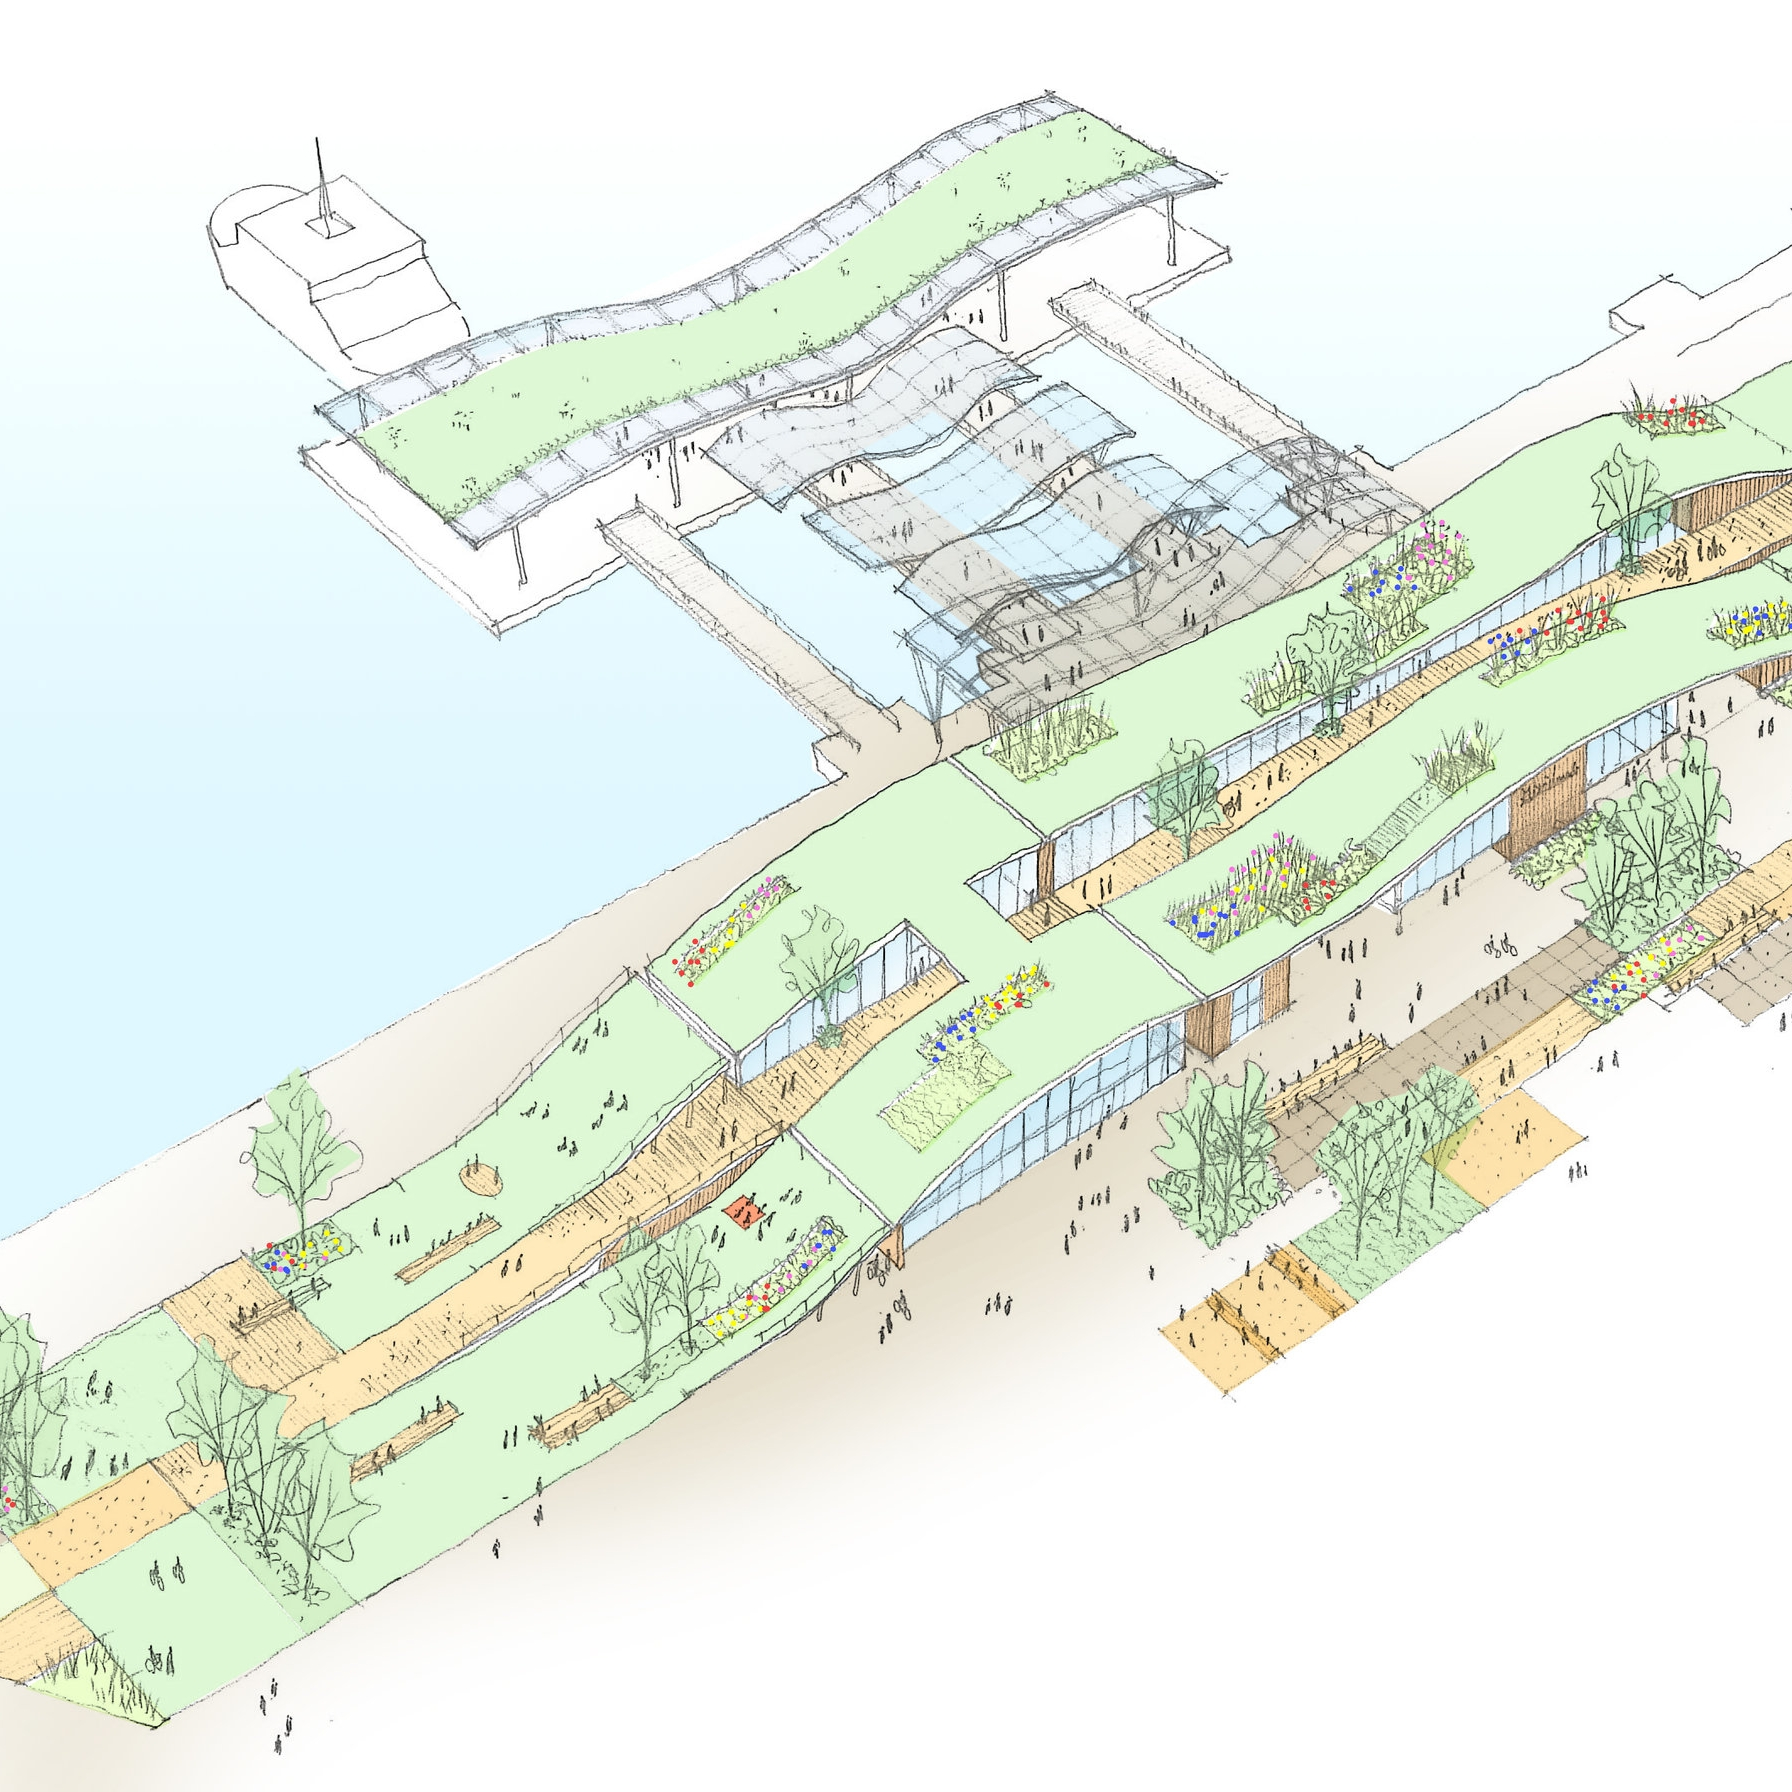 International Urban Planning Competition for Miyajimaguchi Area 2016